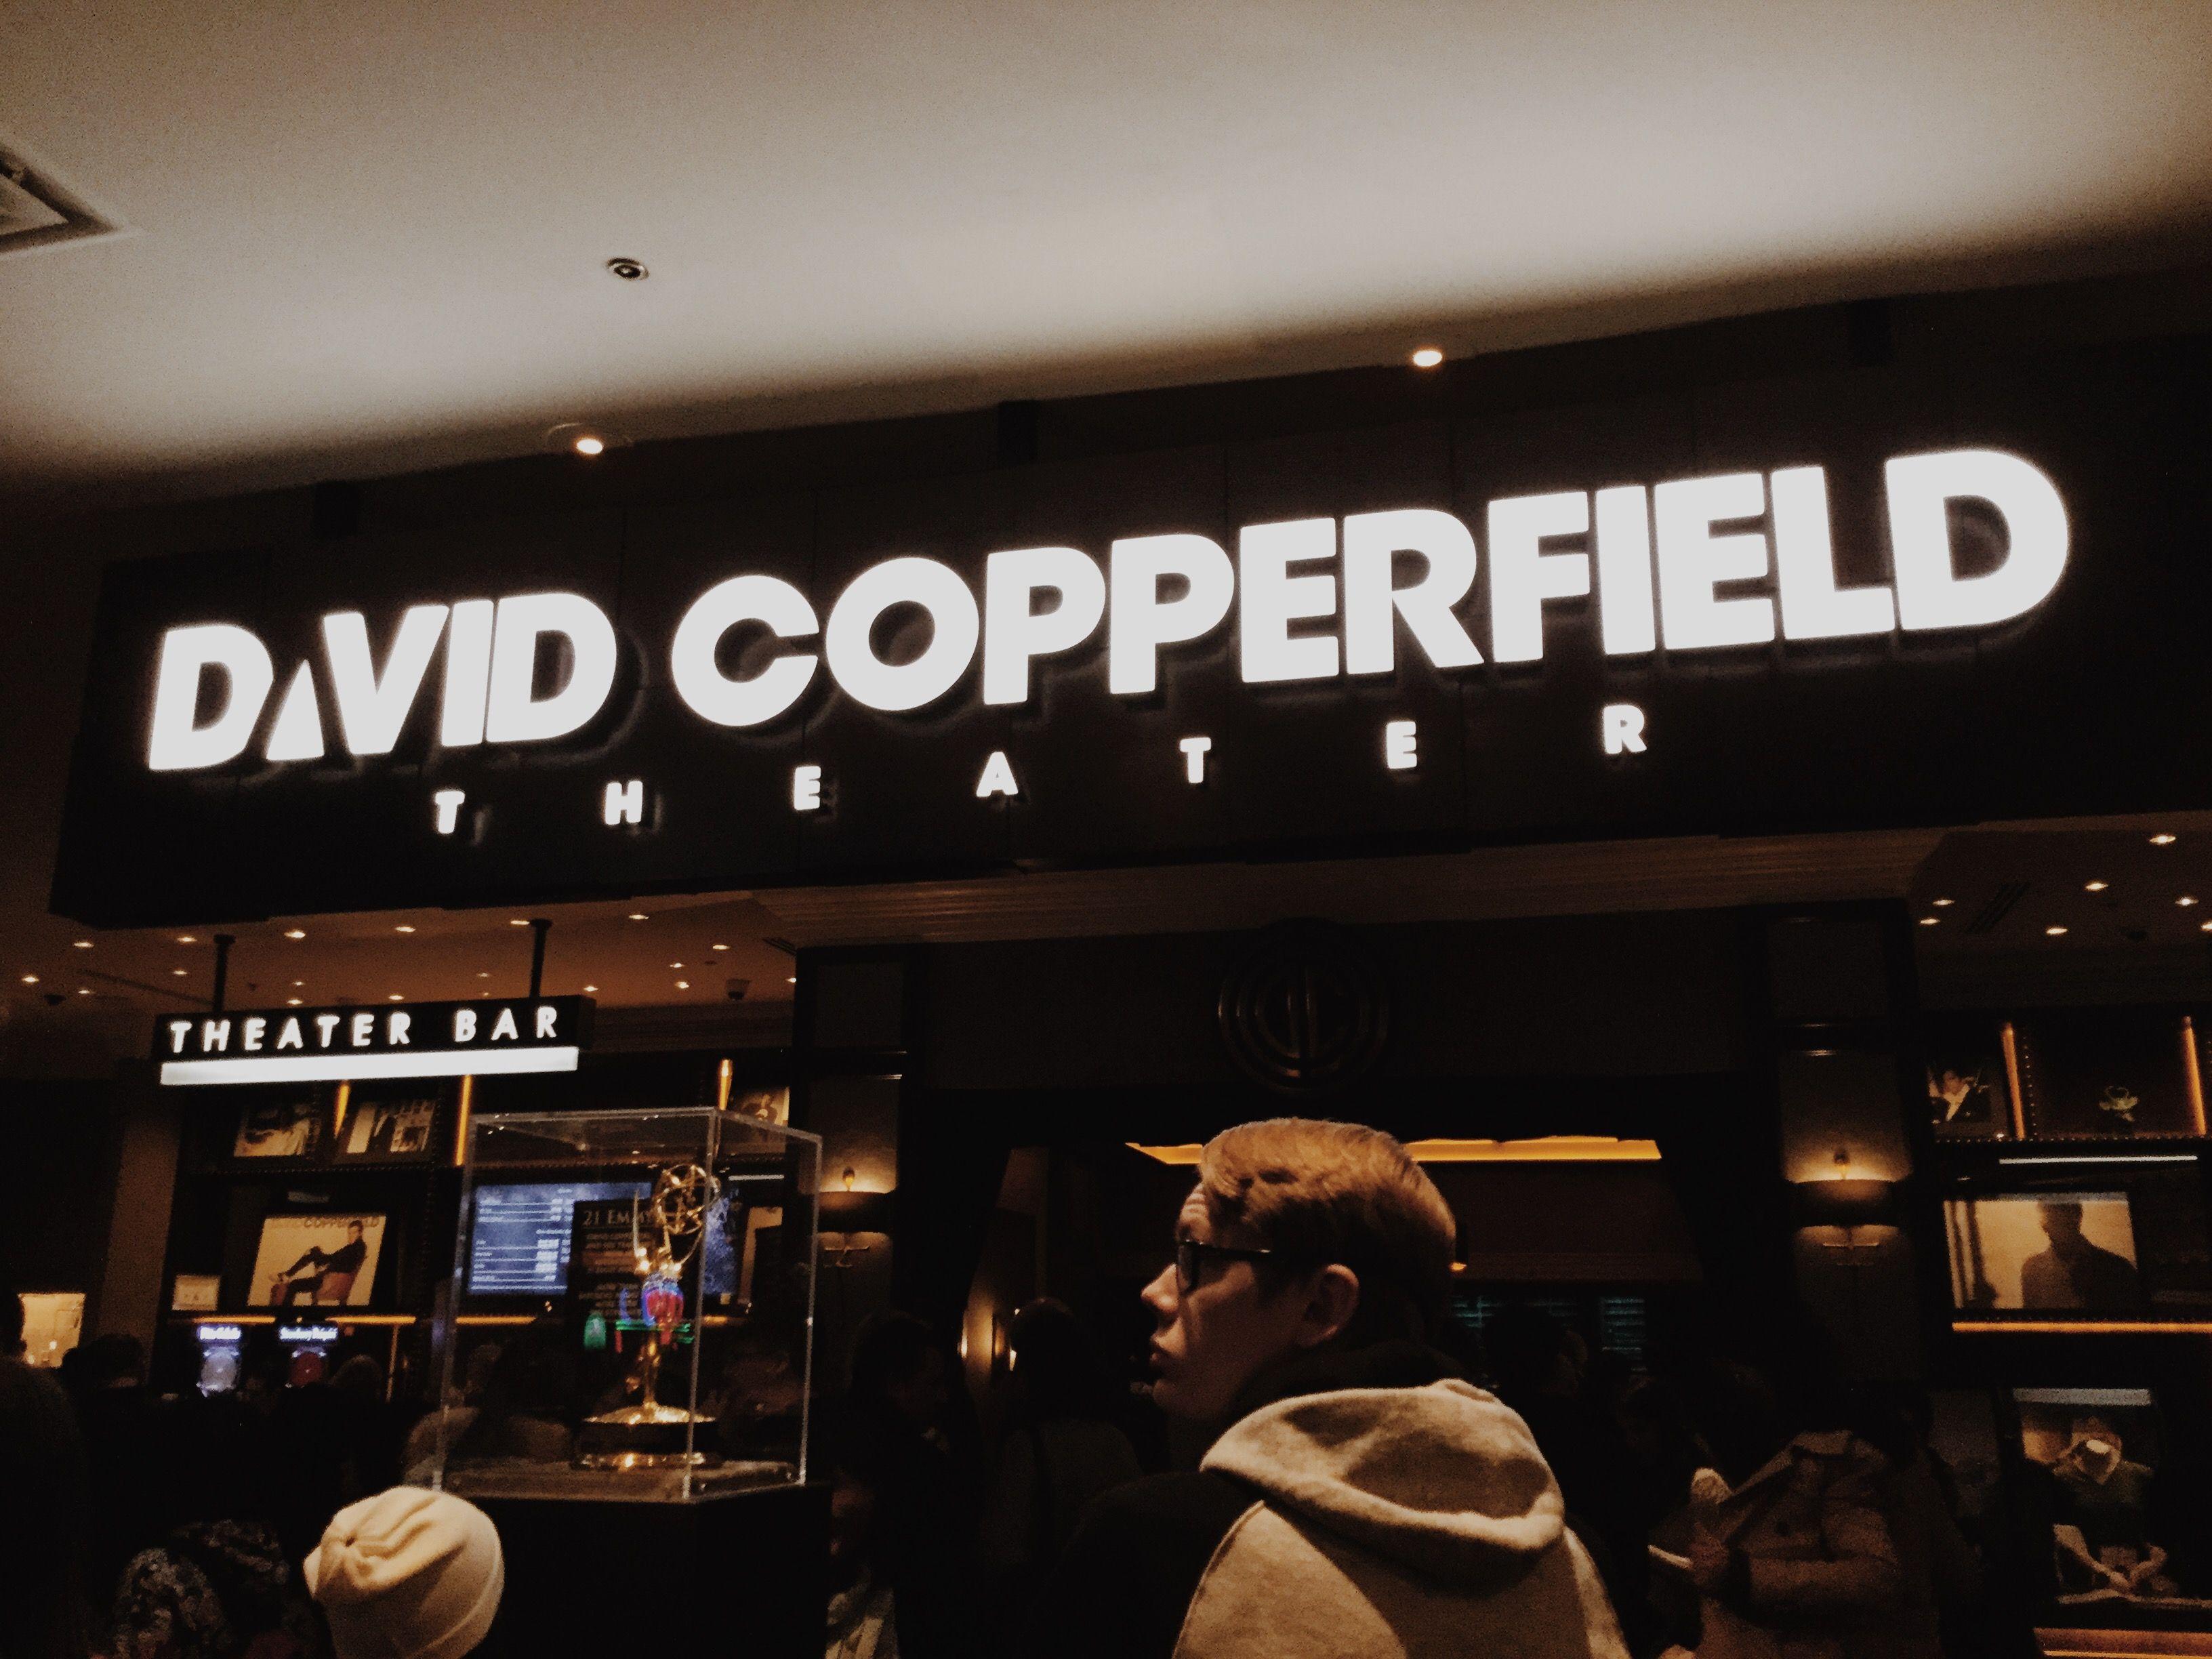 David Copperfield Magic Show in 2020 Magic show, David